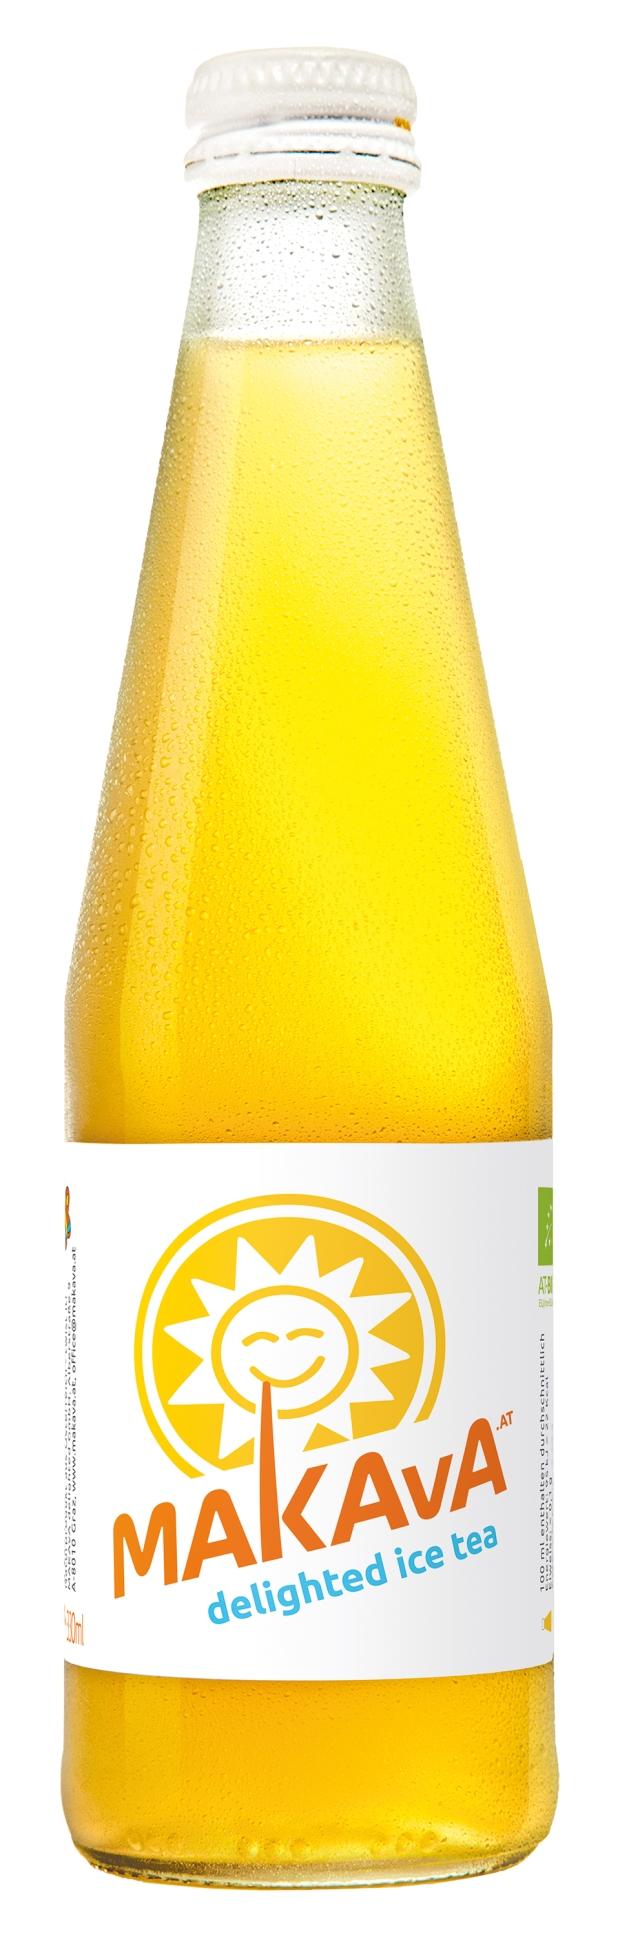 MAKAvA-Flasche+Freistellpfad